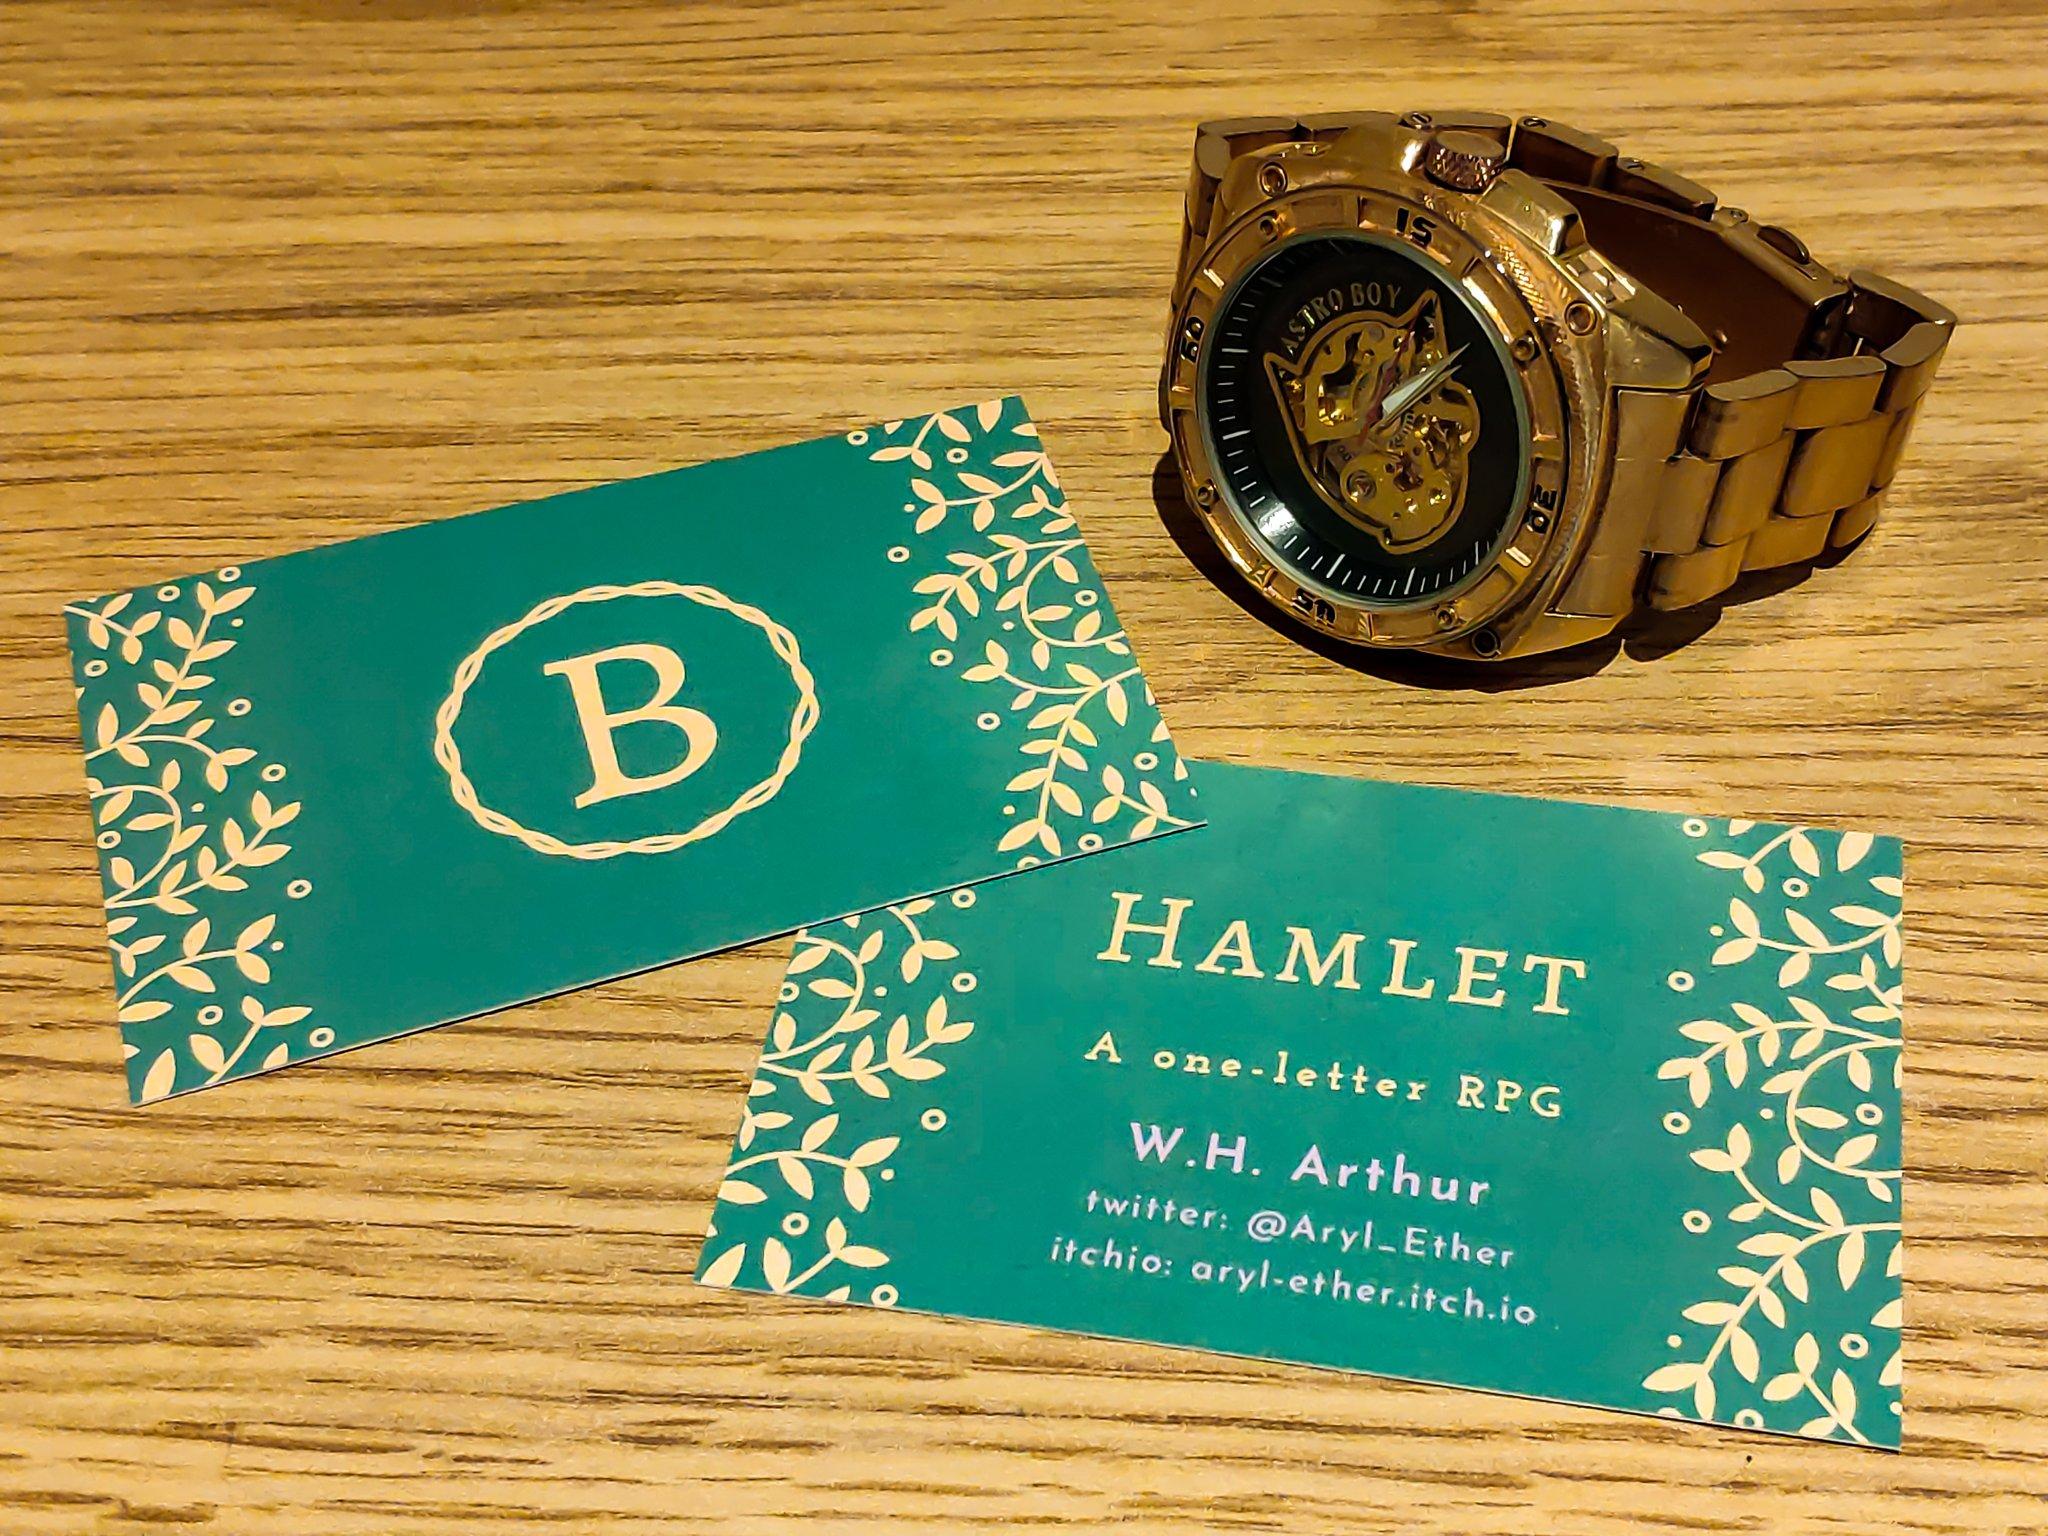 Hamlet: A one-letter RPG